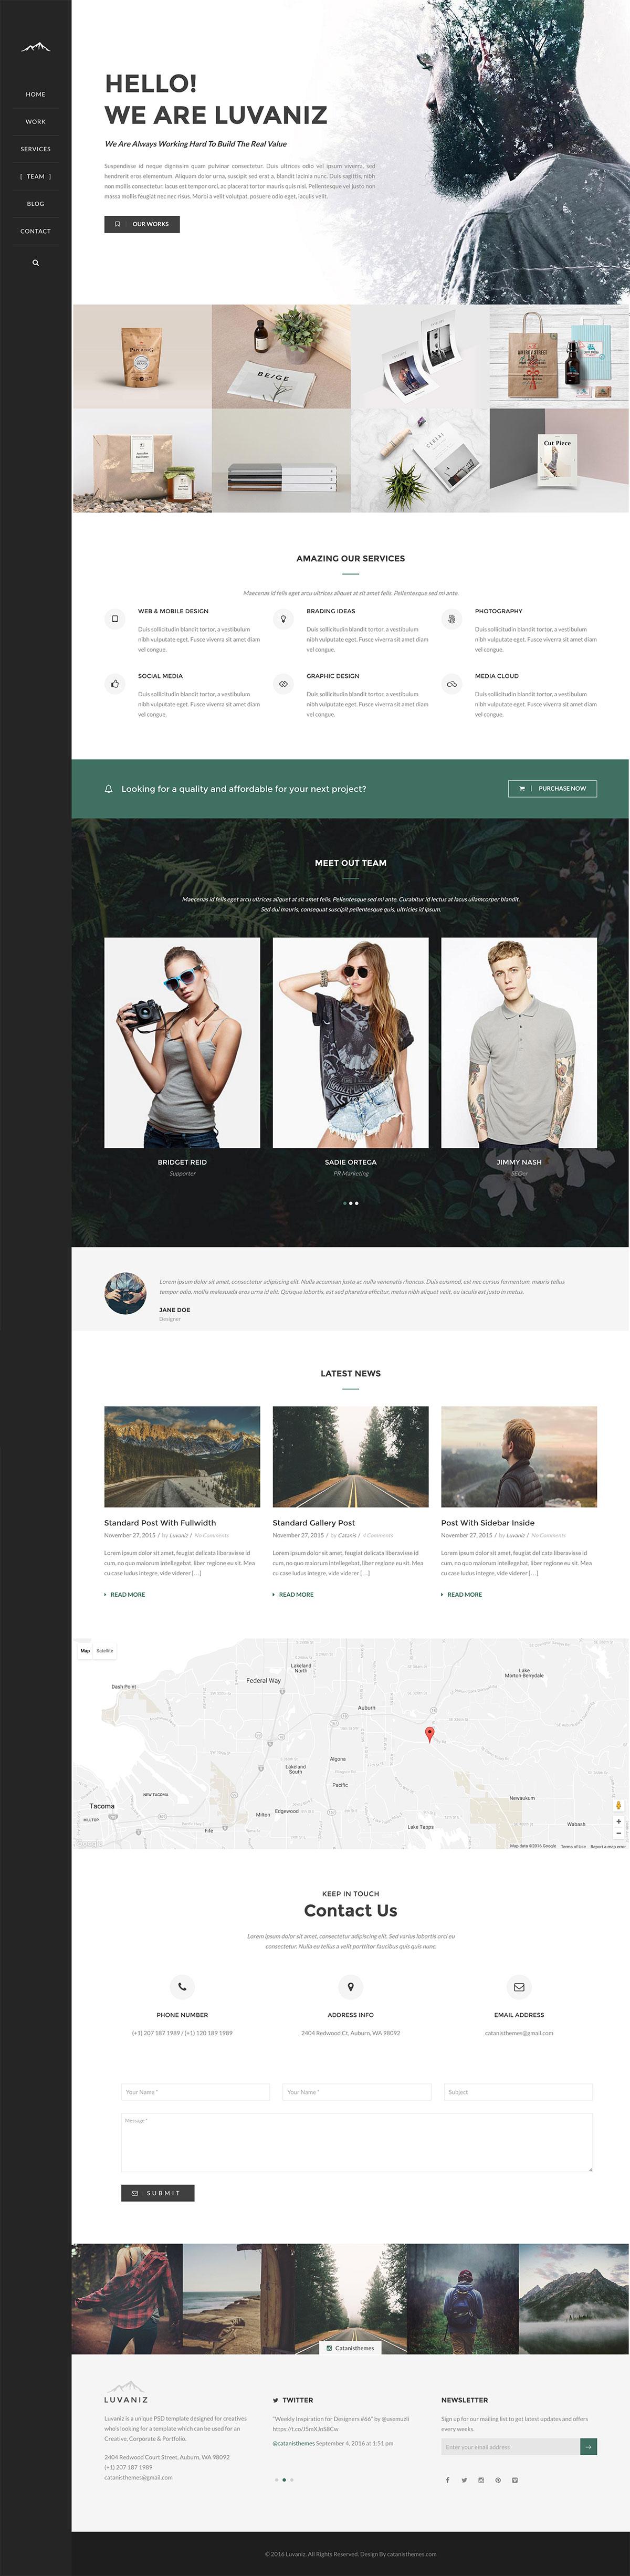 Luvaniz - Creative One Page WordPress Theme